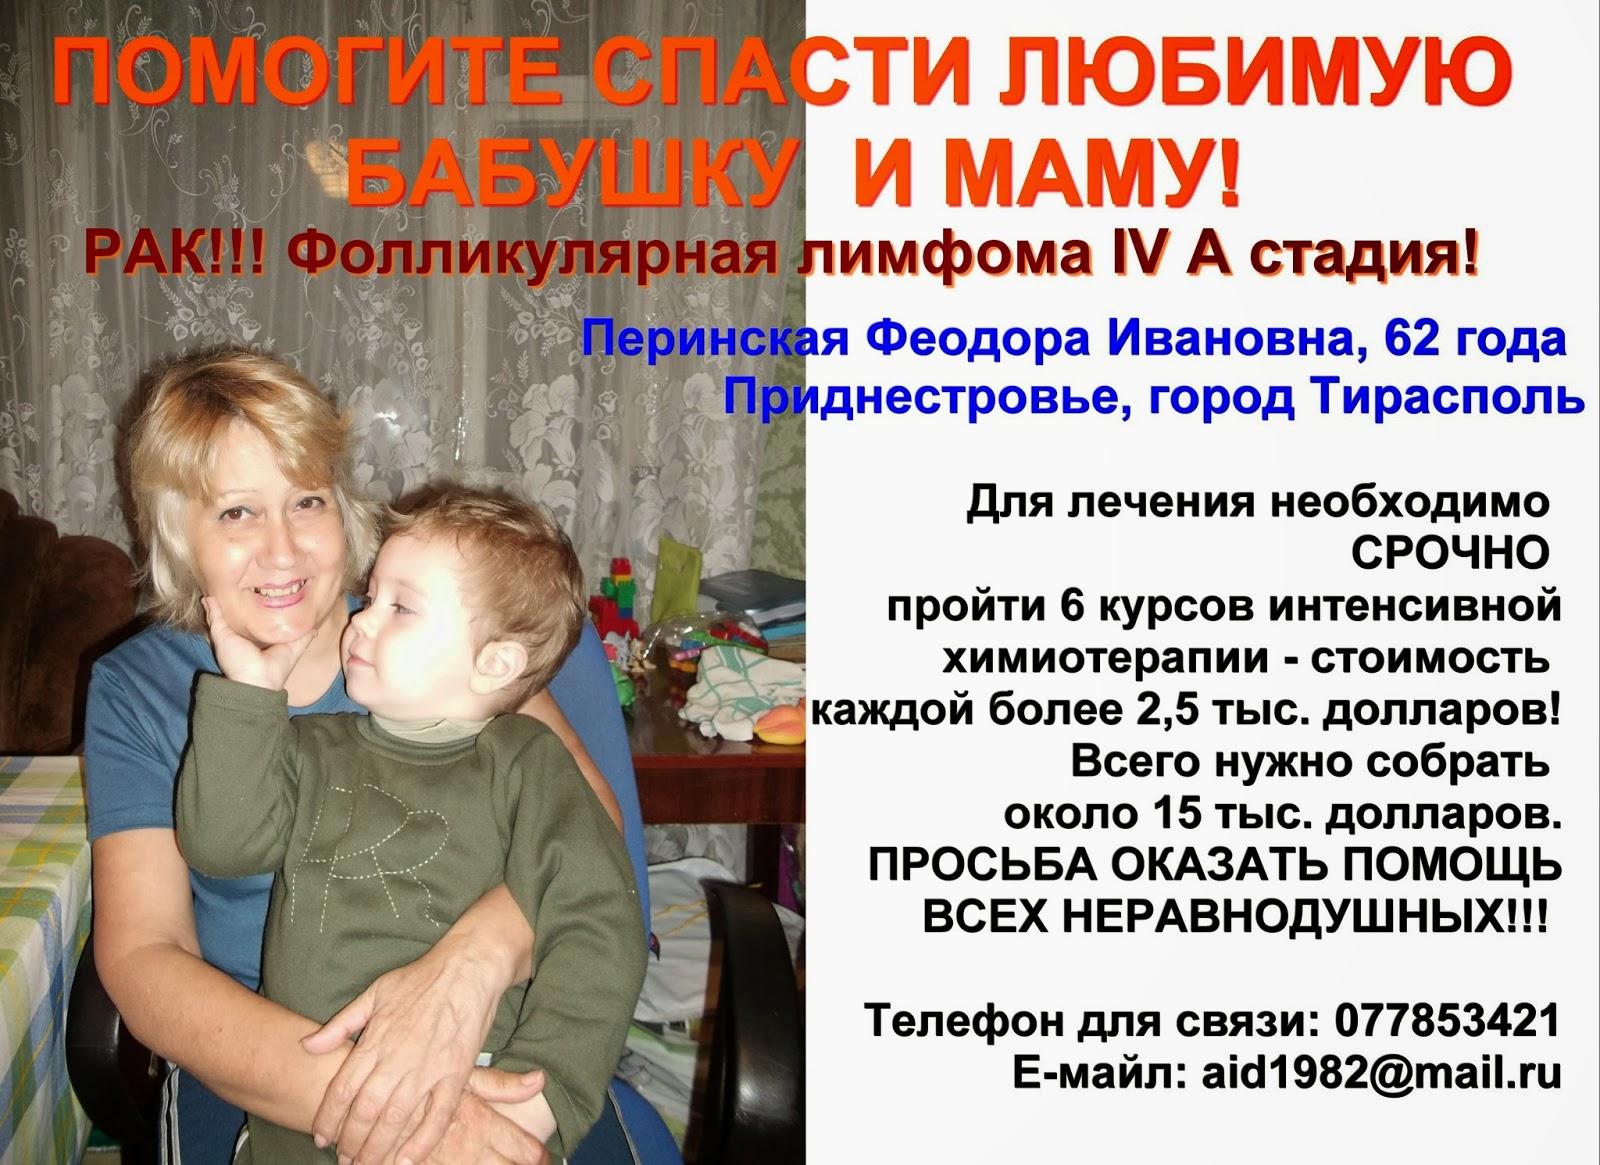 Раком маму онлайн 2 фотография